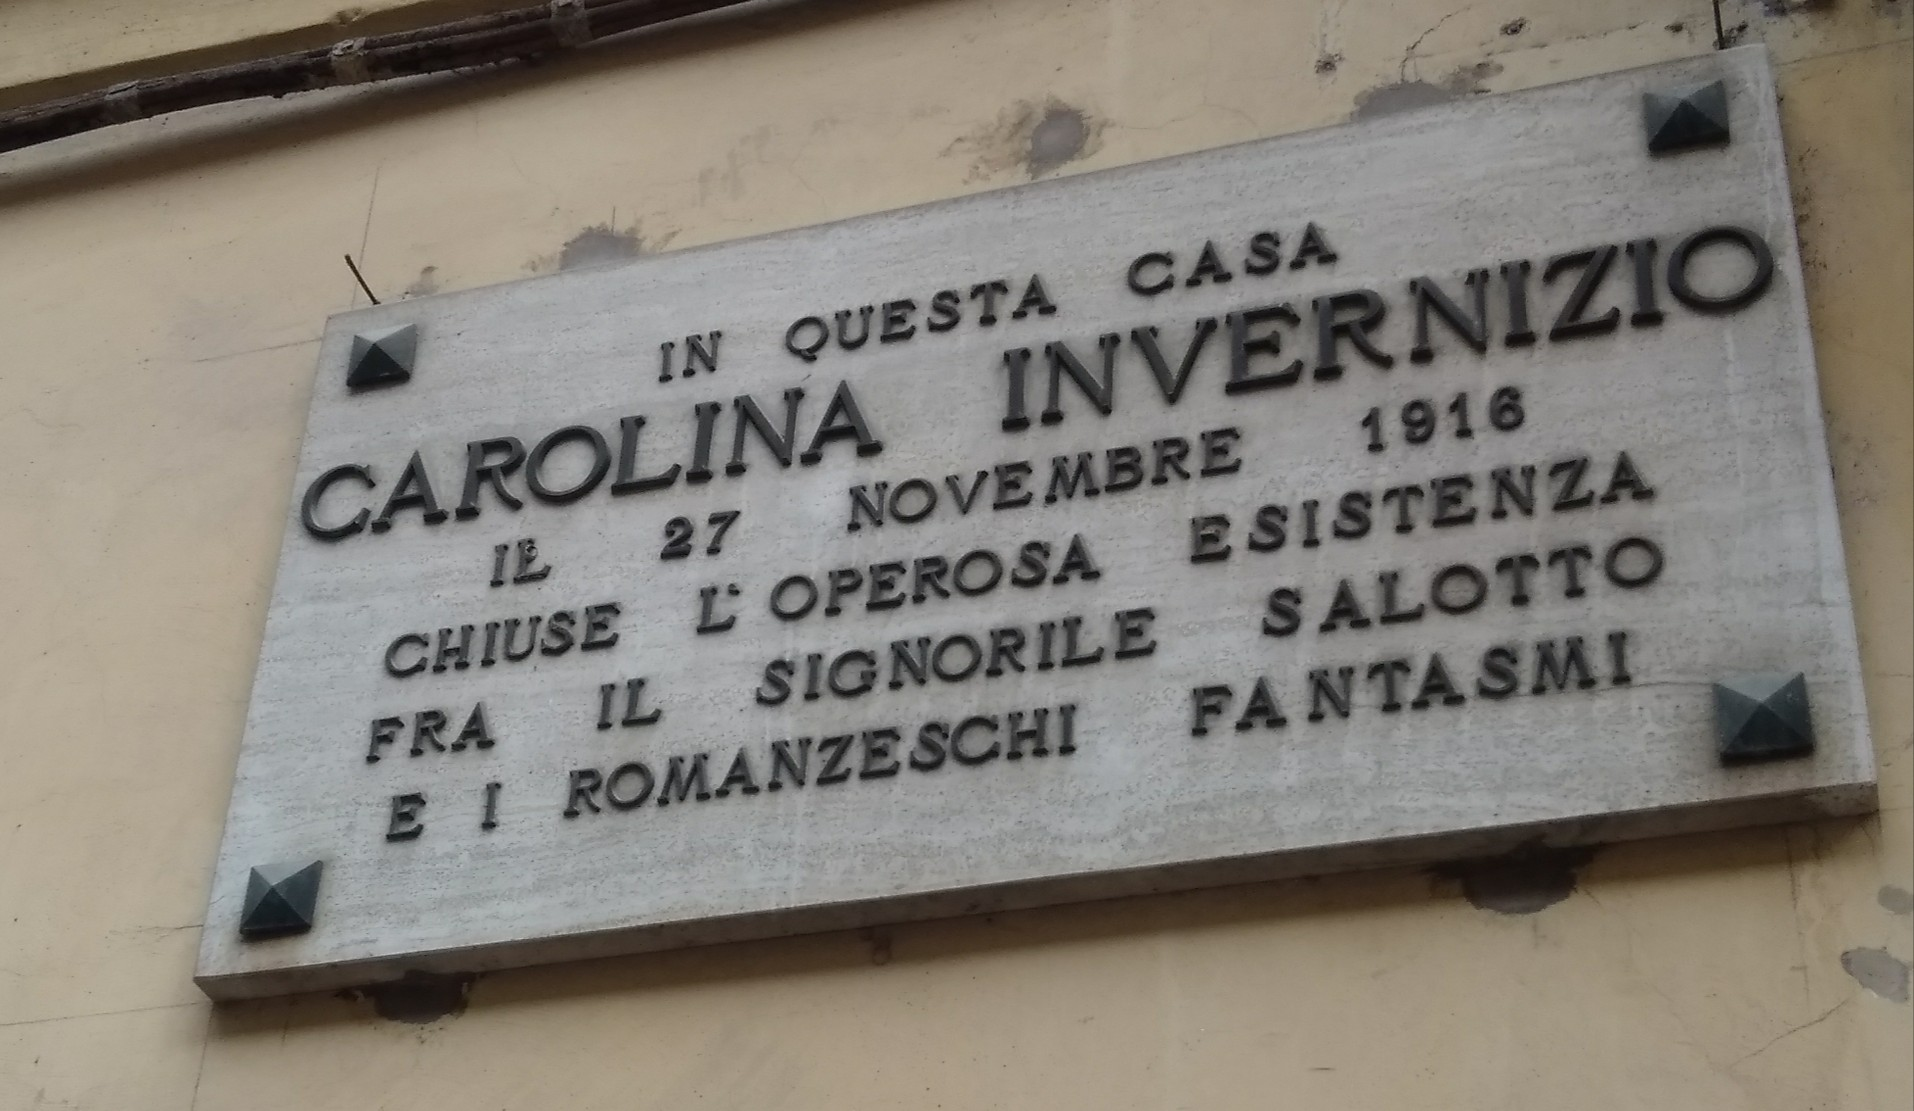 lapide Invernizio Carolina